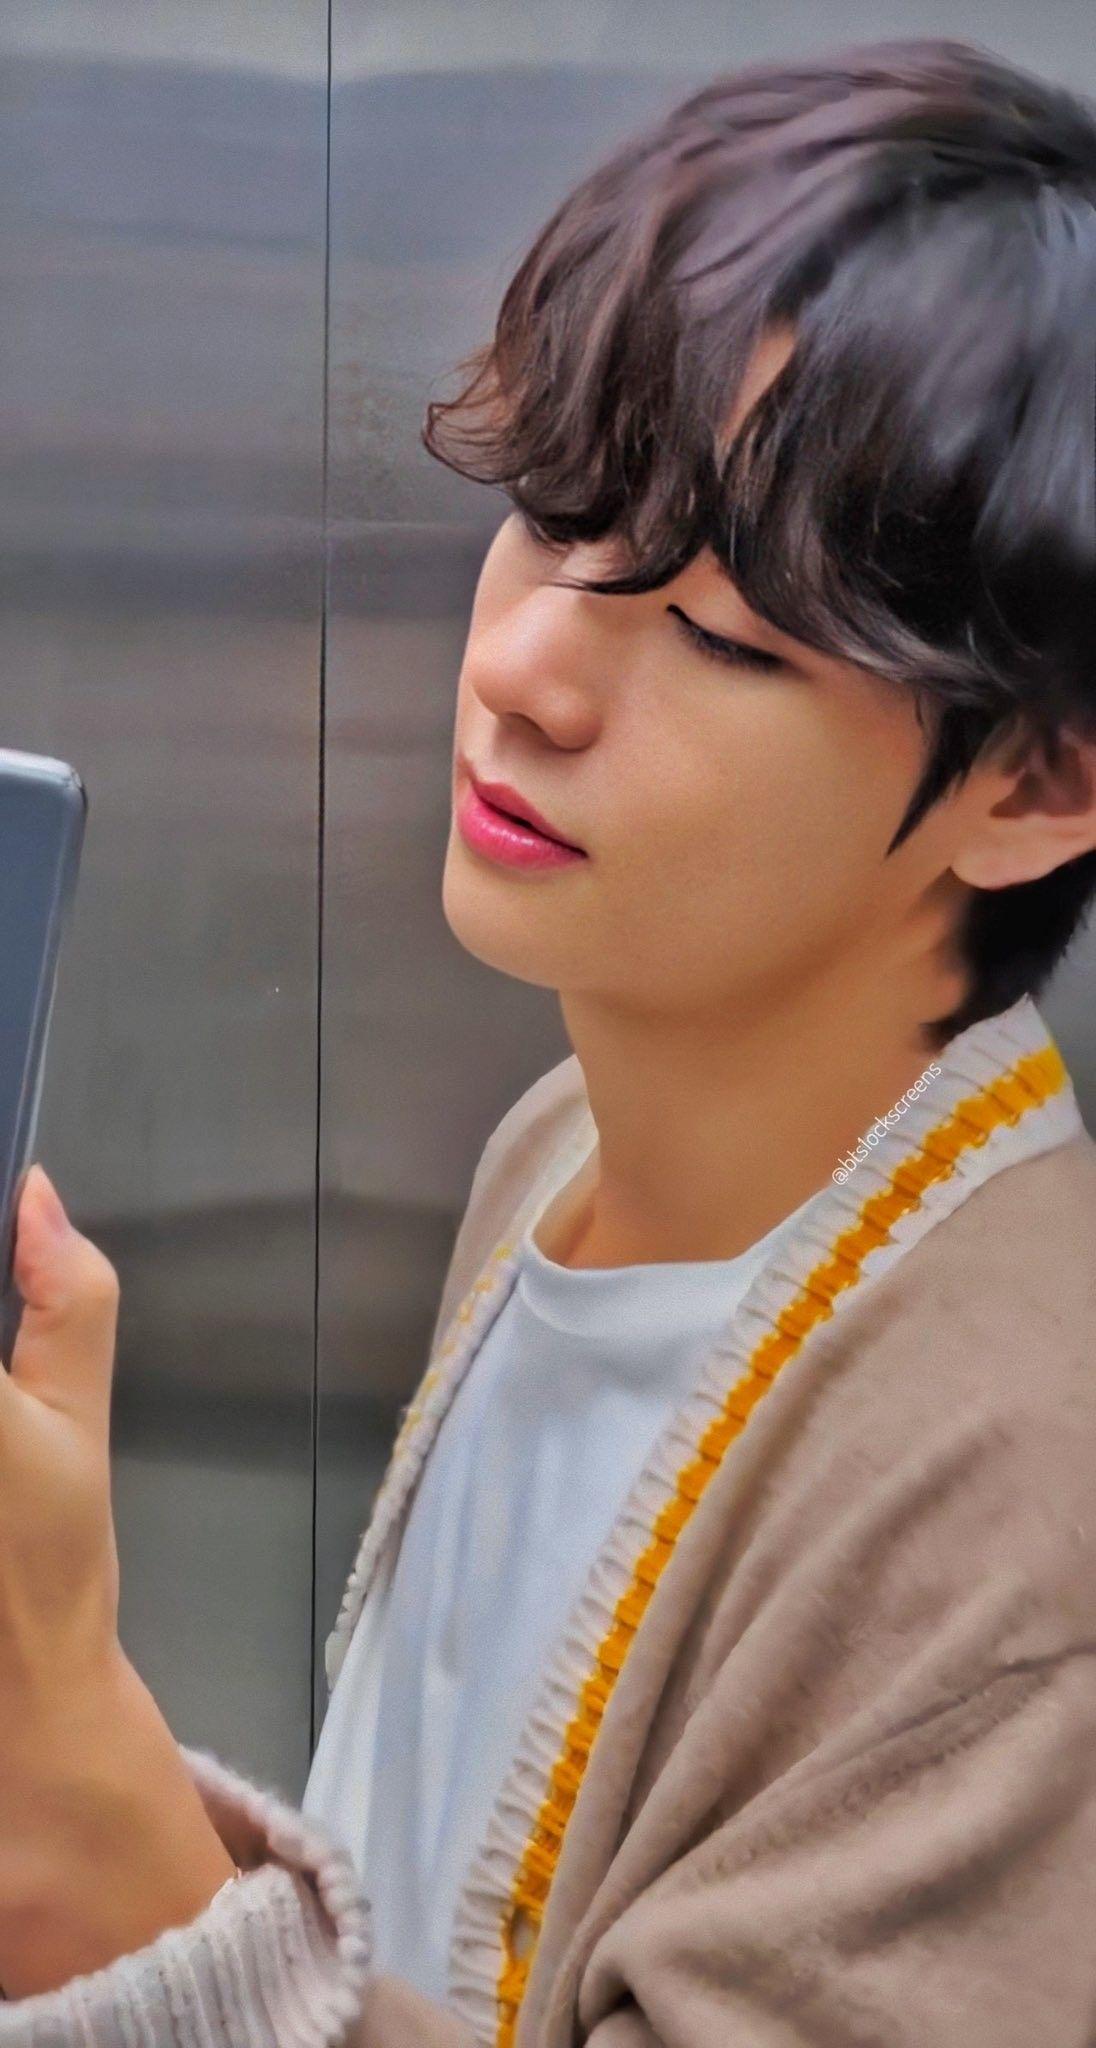 Bts X Samsung V Kim Taehyung Tae Boyfriend Material Lockscreens Wallpapers In 2020 Taehyung Photoshoot Kim Taehyung Wallpaper Taehyung